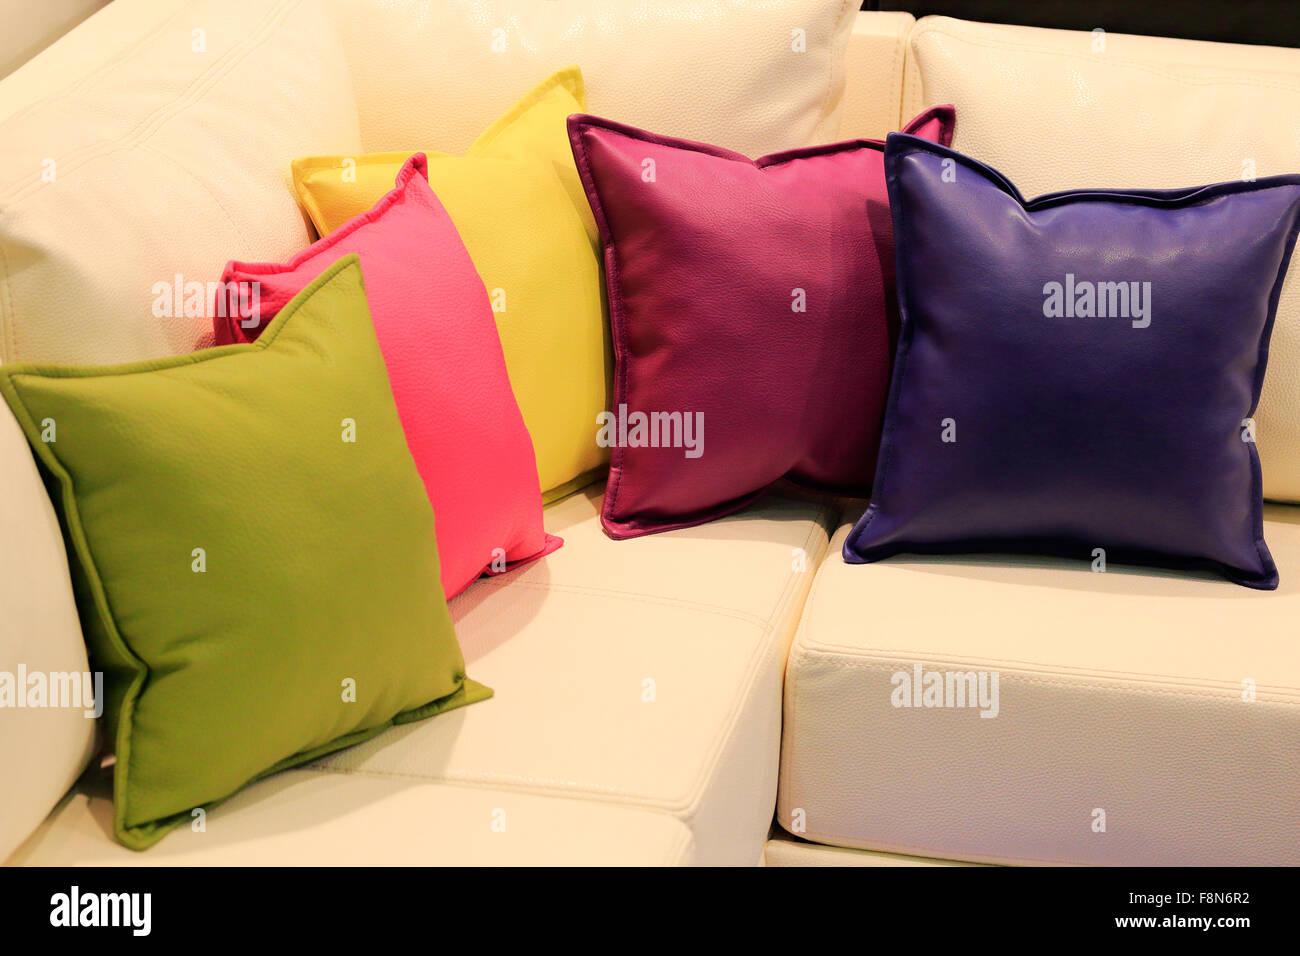 Canapé Multi Couleur en ce qui concerne multi colored leather sofa photos & multi colored leather sofa